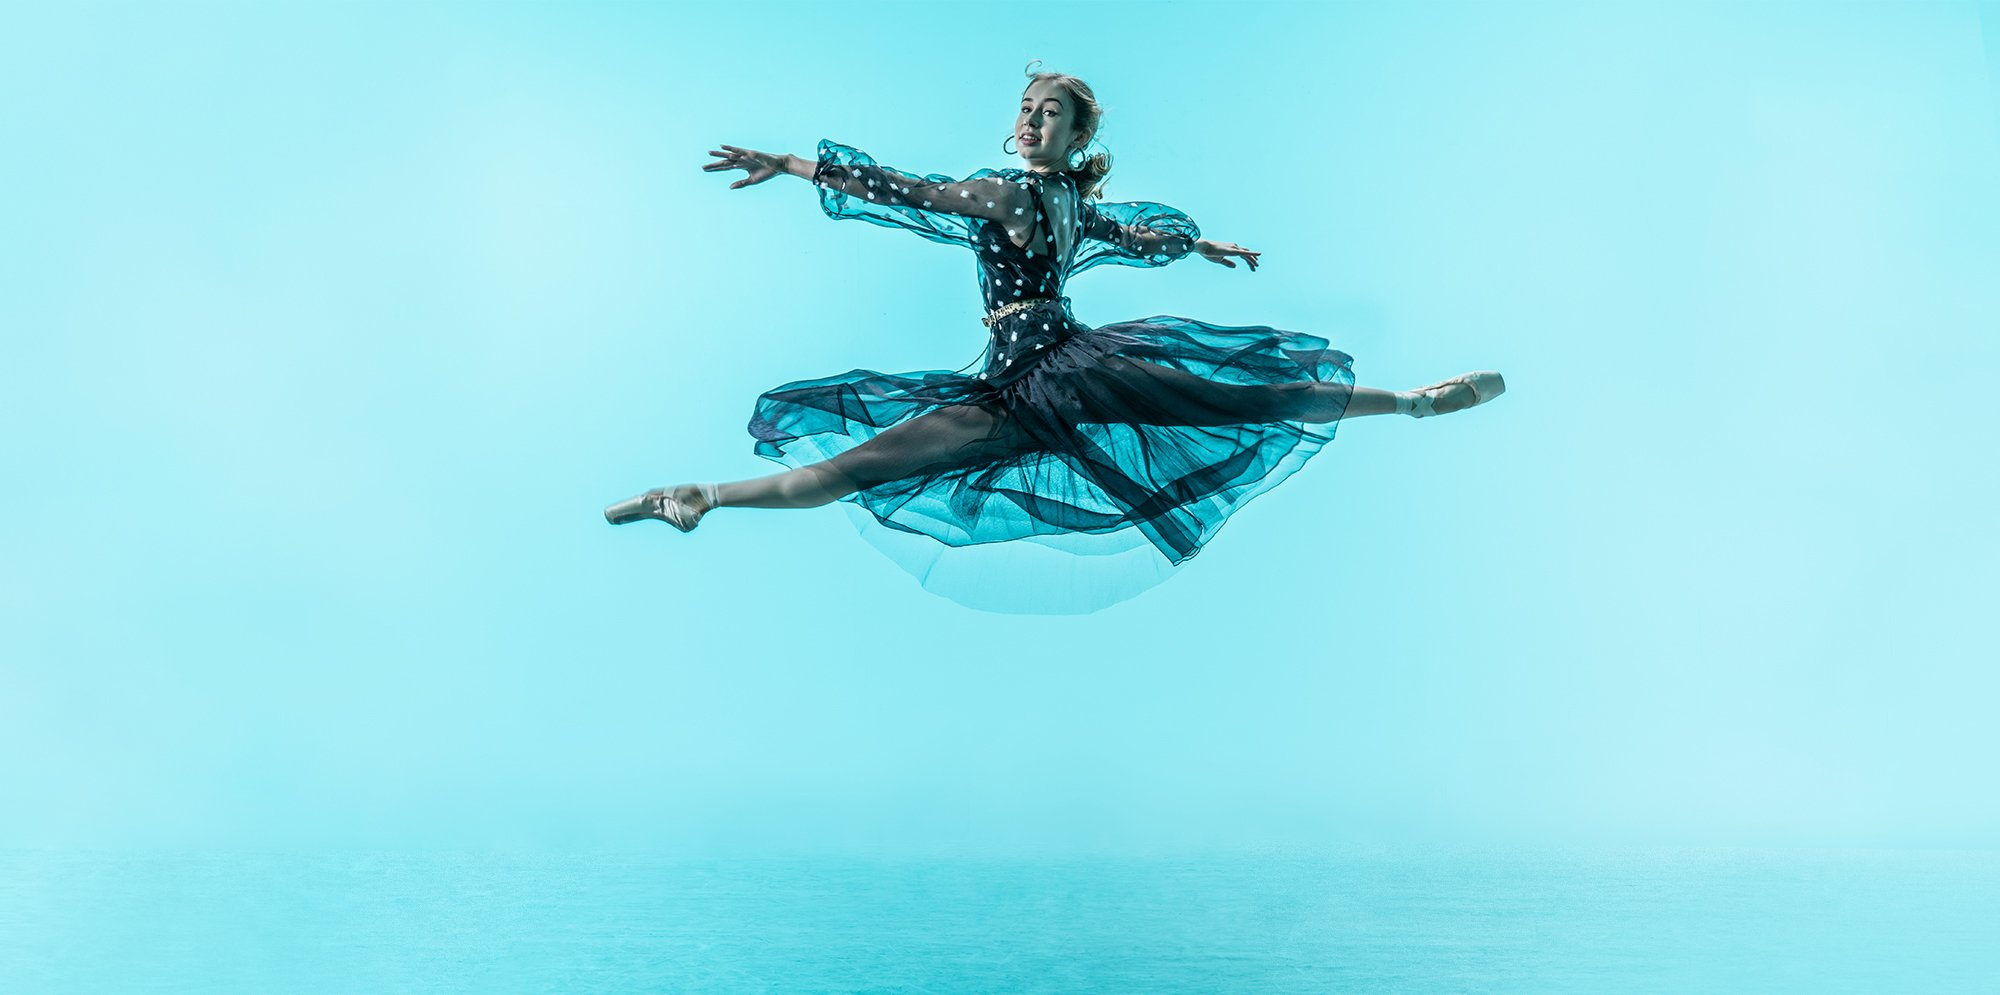 a ballet dancer leaping